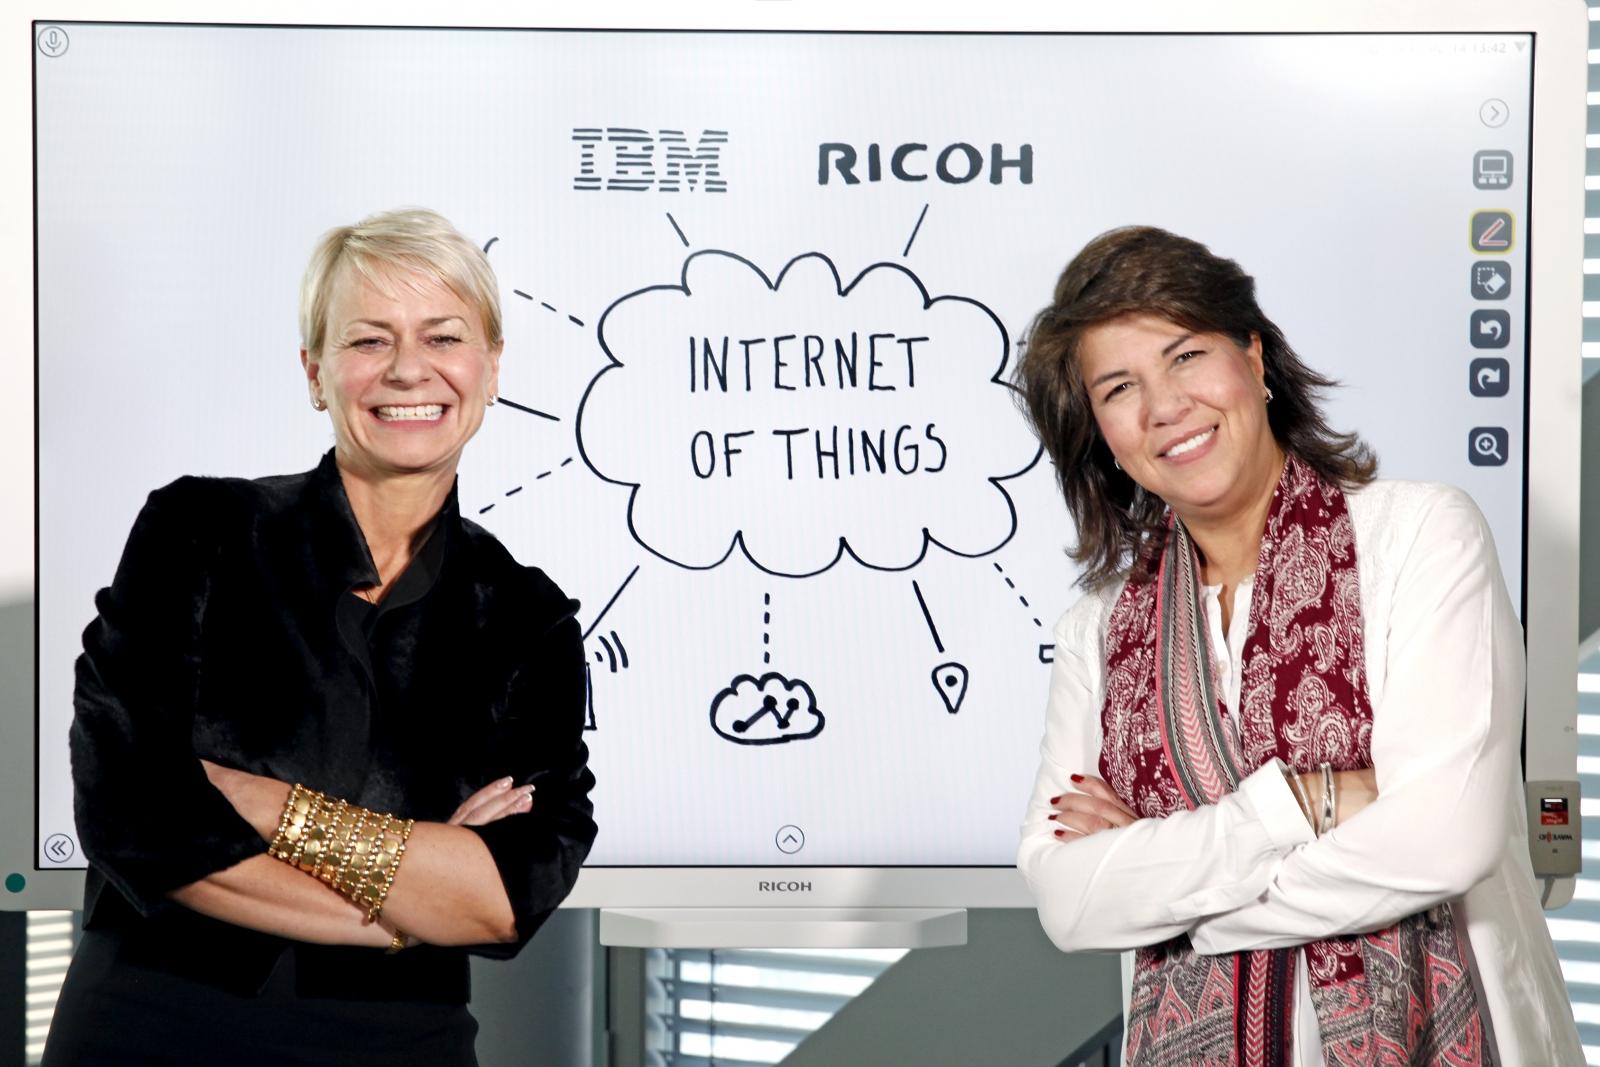 Harriet Green Ilse Aigner IBM Watson